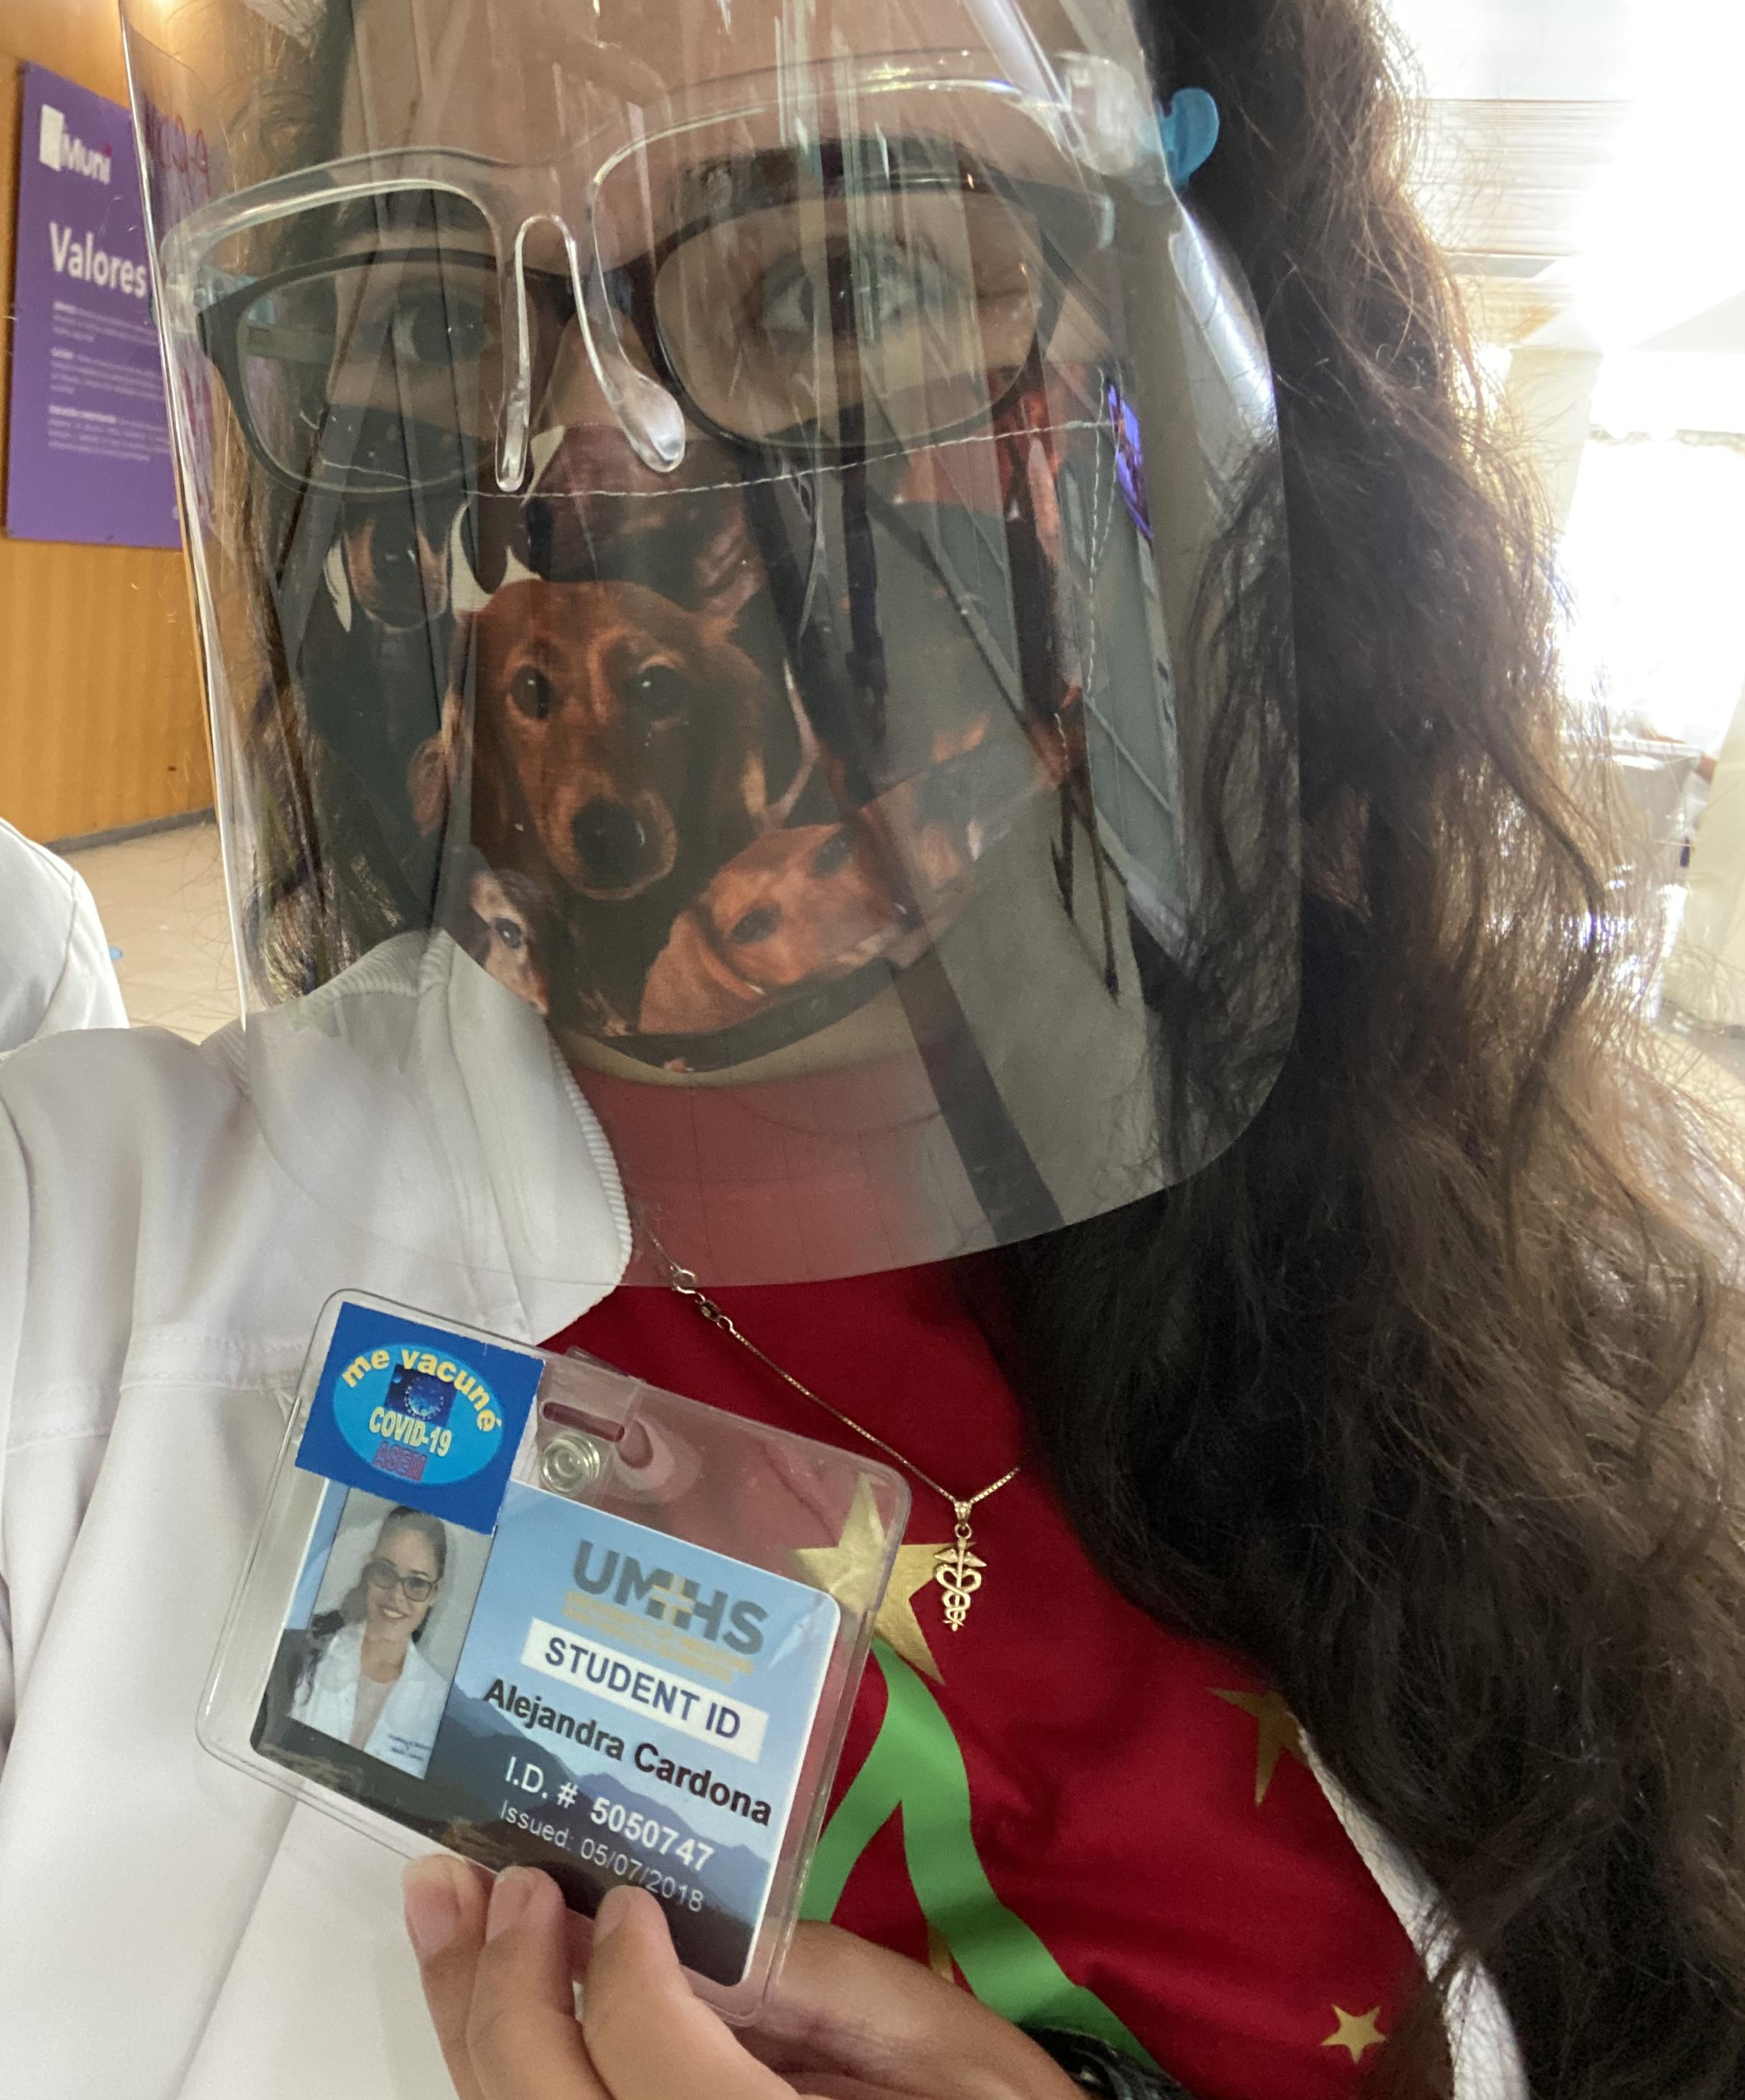 Alejandra Cardona in mask